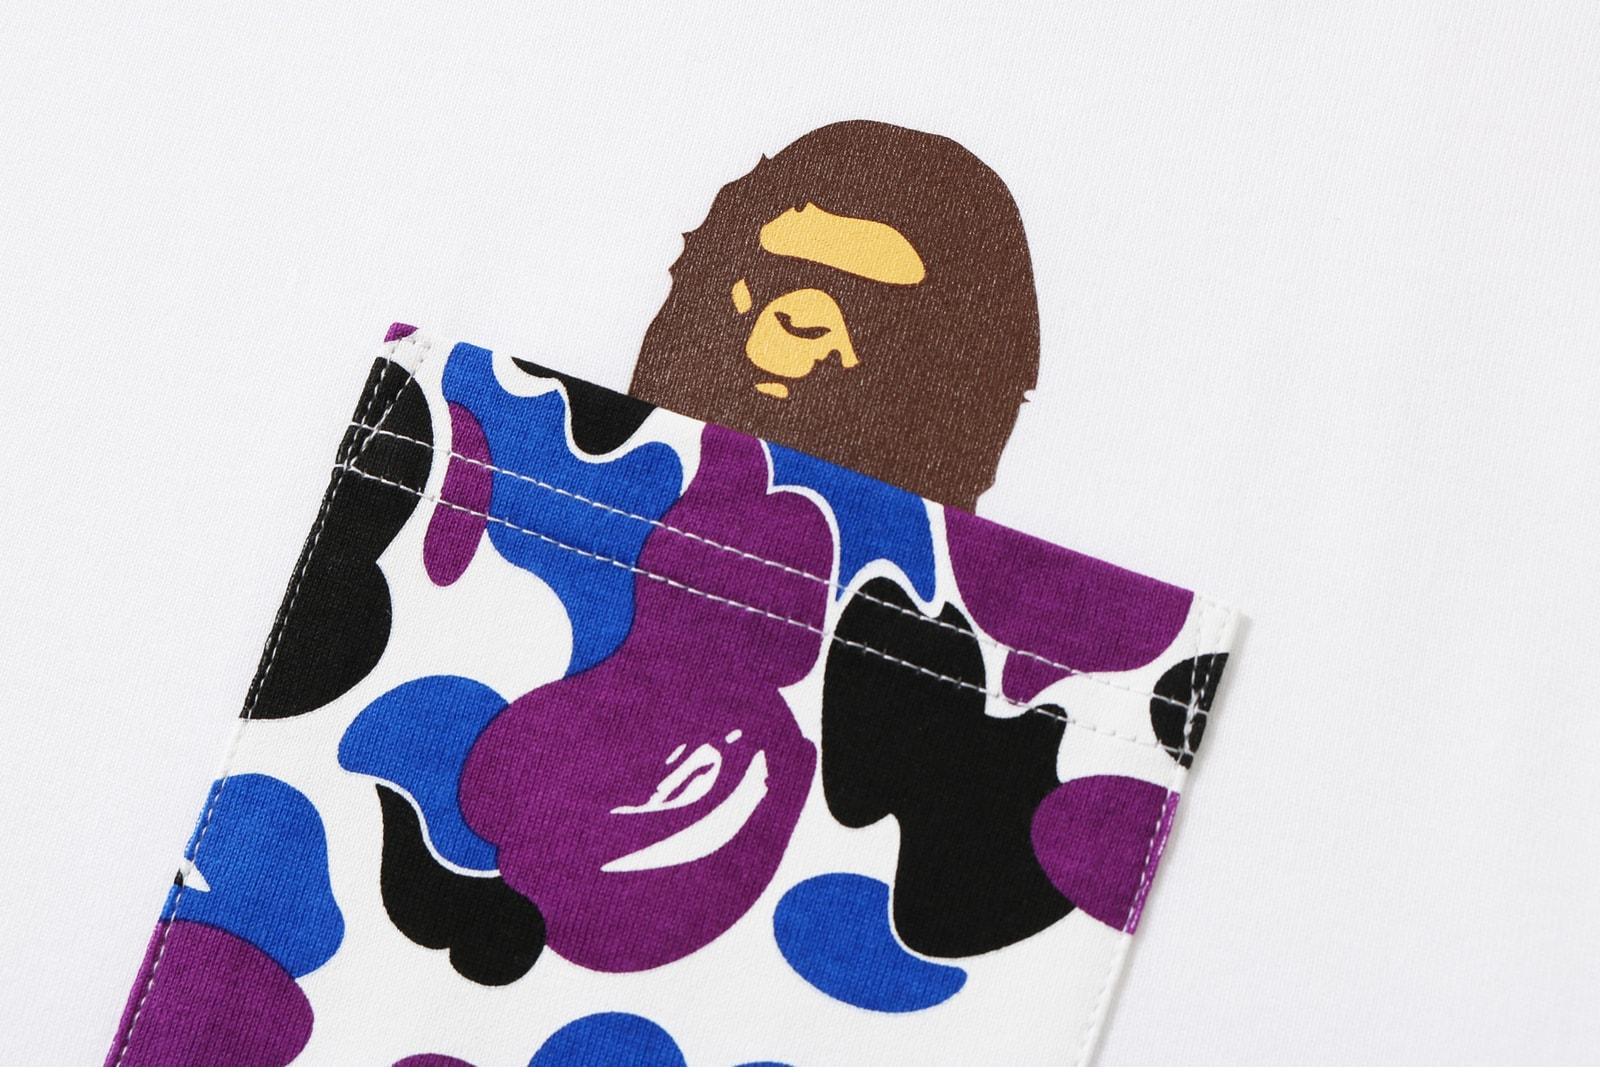 BAPE Hong Kong 13th Anniversary Capsule a bathing ape lookbooks baby milo china porter bags accessories